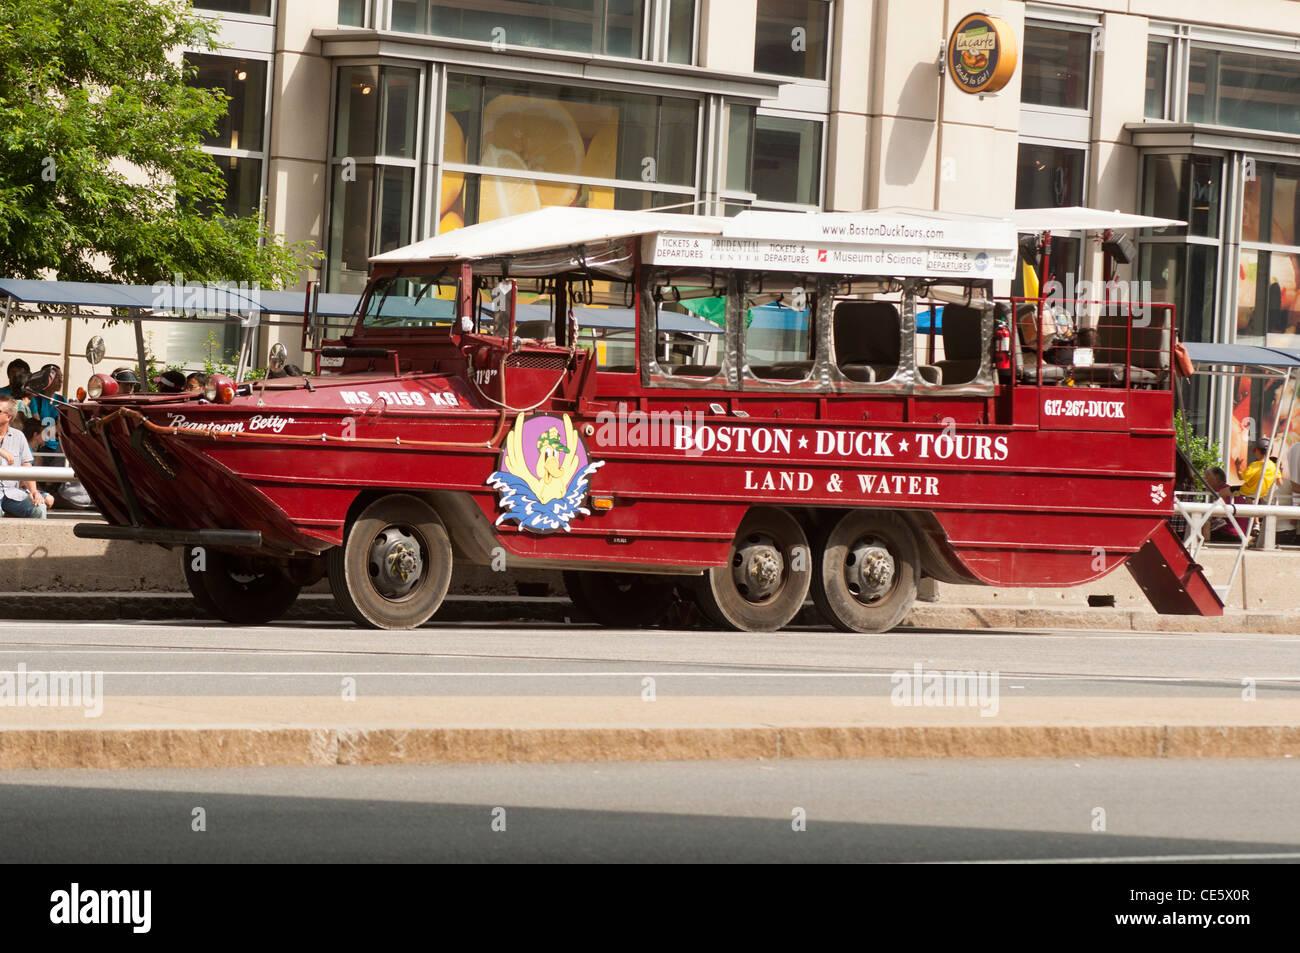 Boston Duck Tour Land And Water Boat Truck Amphibian